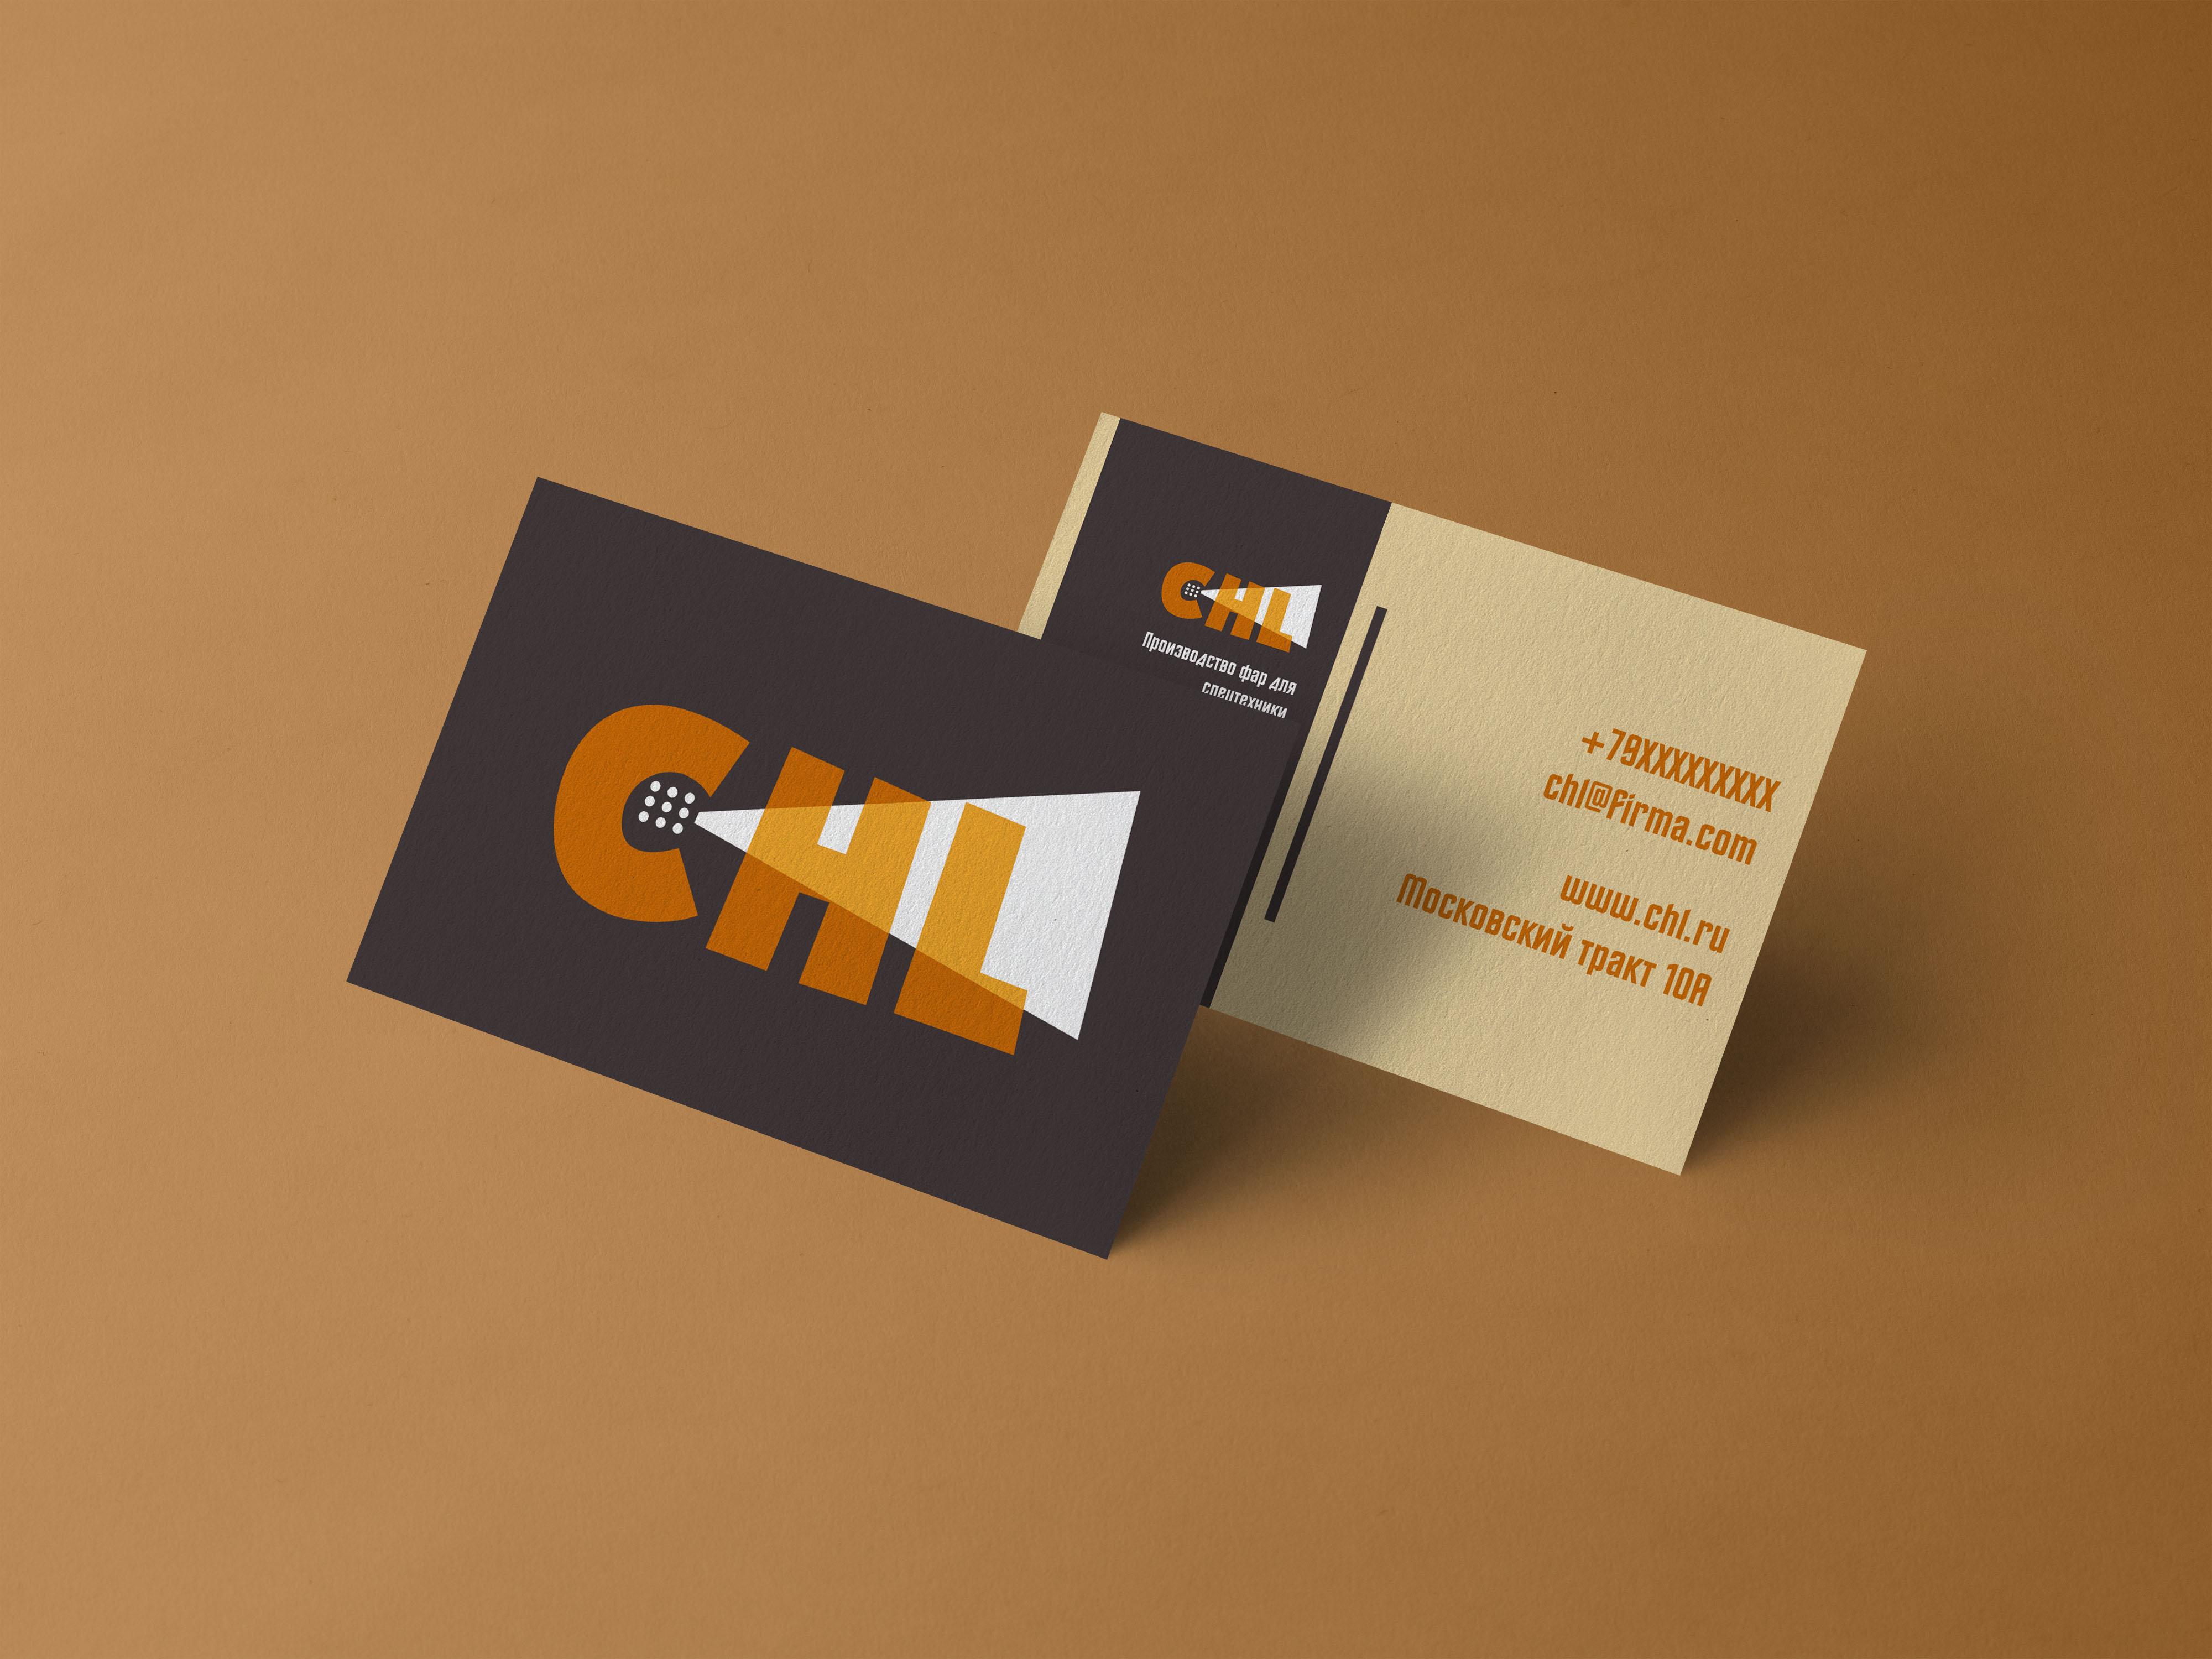 разработка логотипа для производителя фар фото f_4055f5a493da1db4.jpg